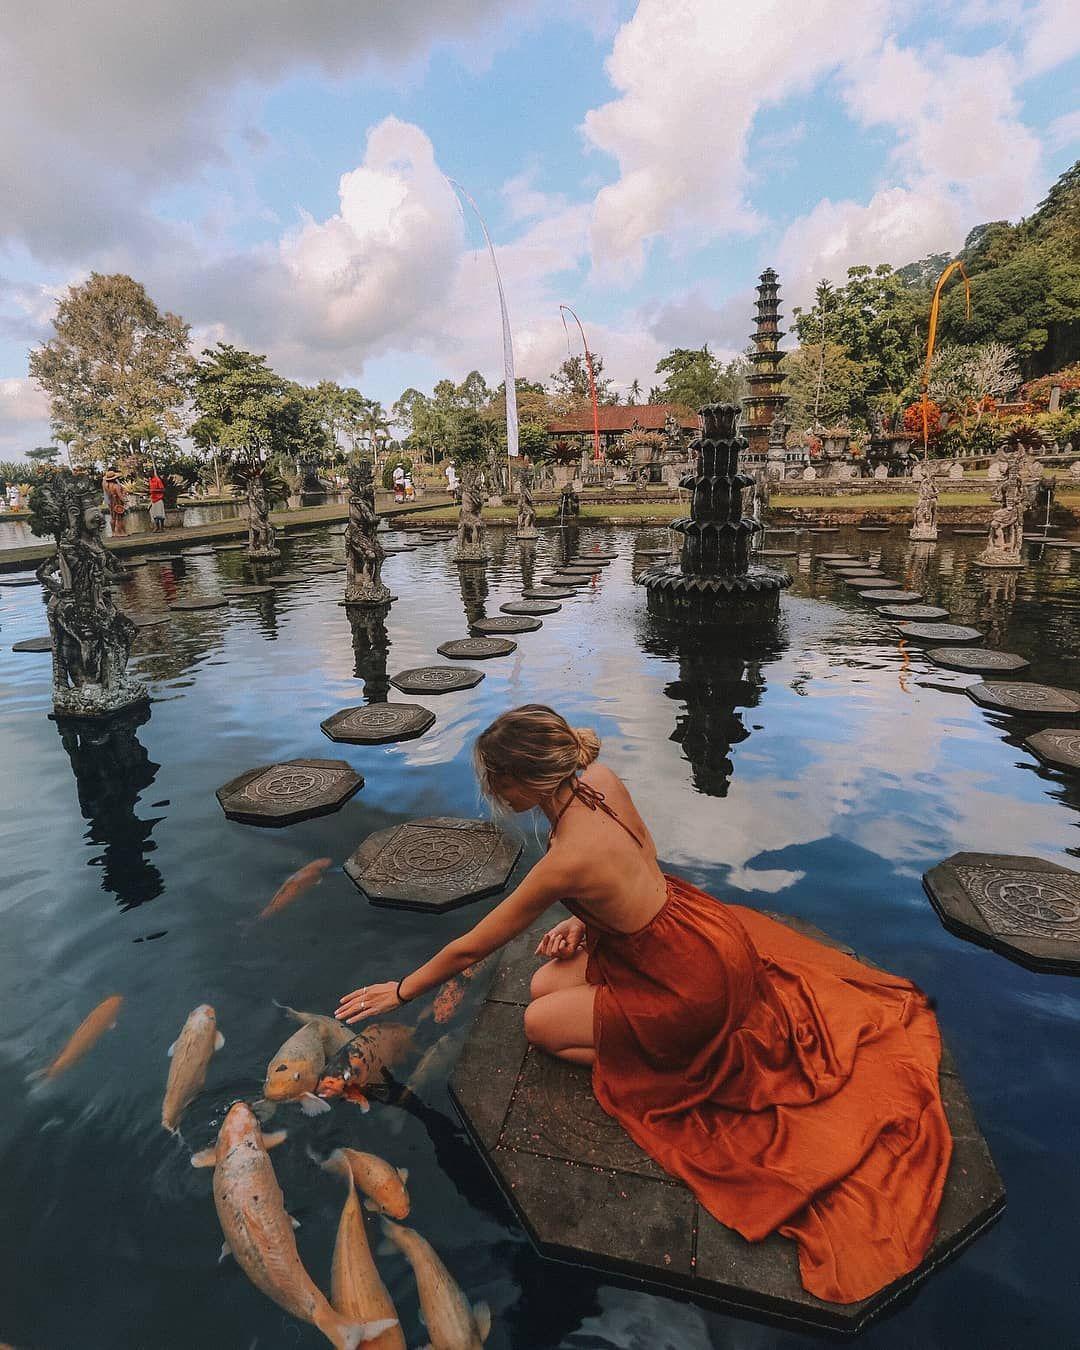 Speechlessplaces Community On Instagram Exploring Bali Via Meryldenis Tirta Gangga Lugares De Vacaciones Viajes Viajes Fotos